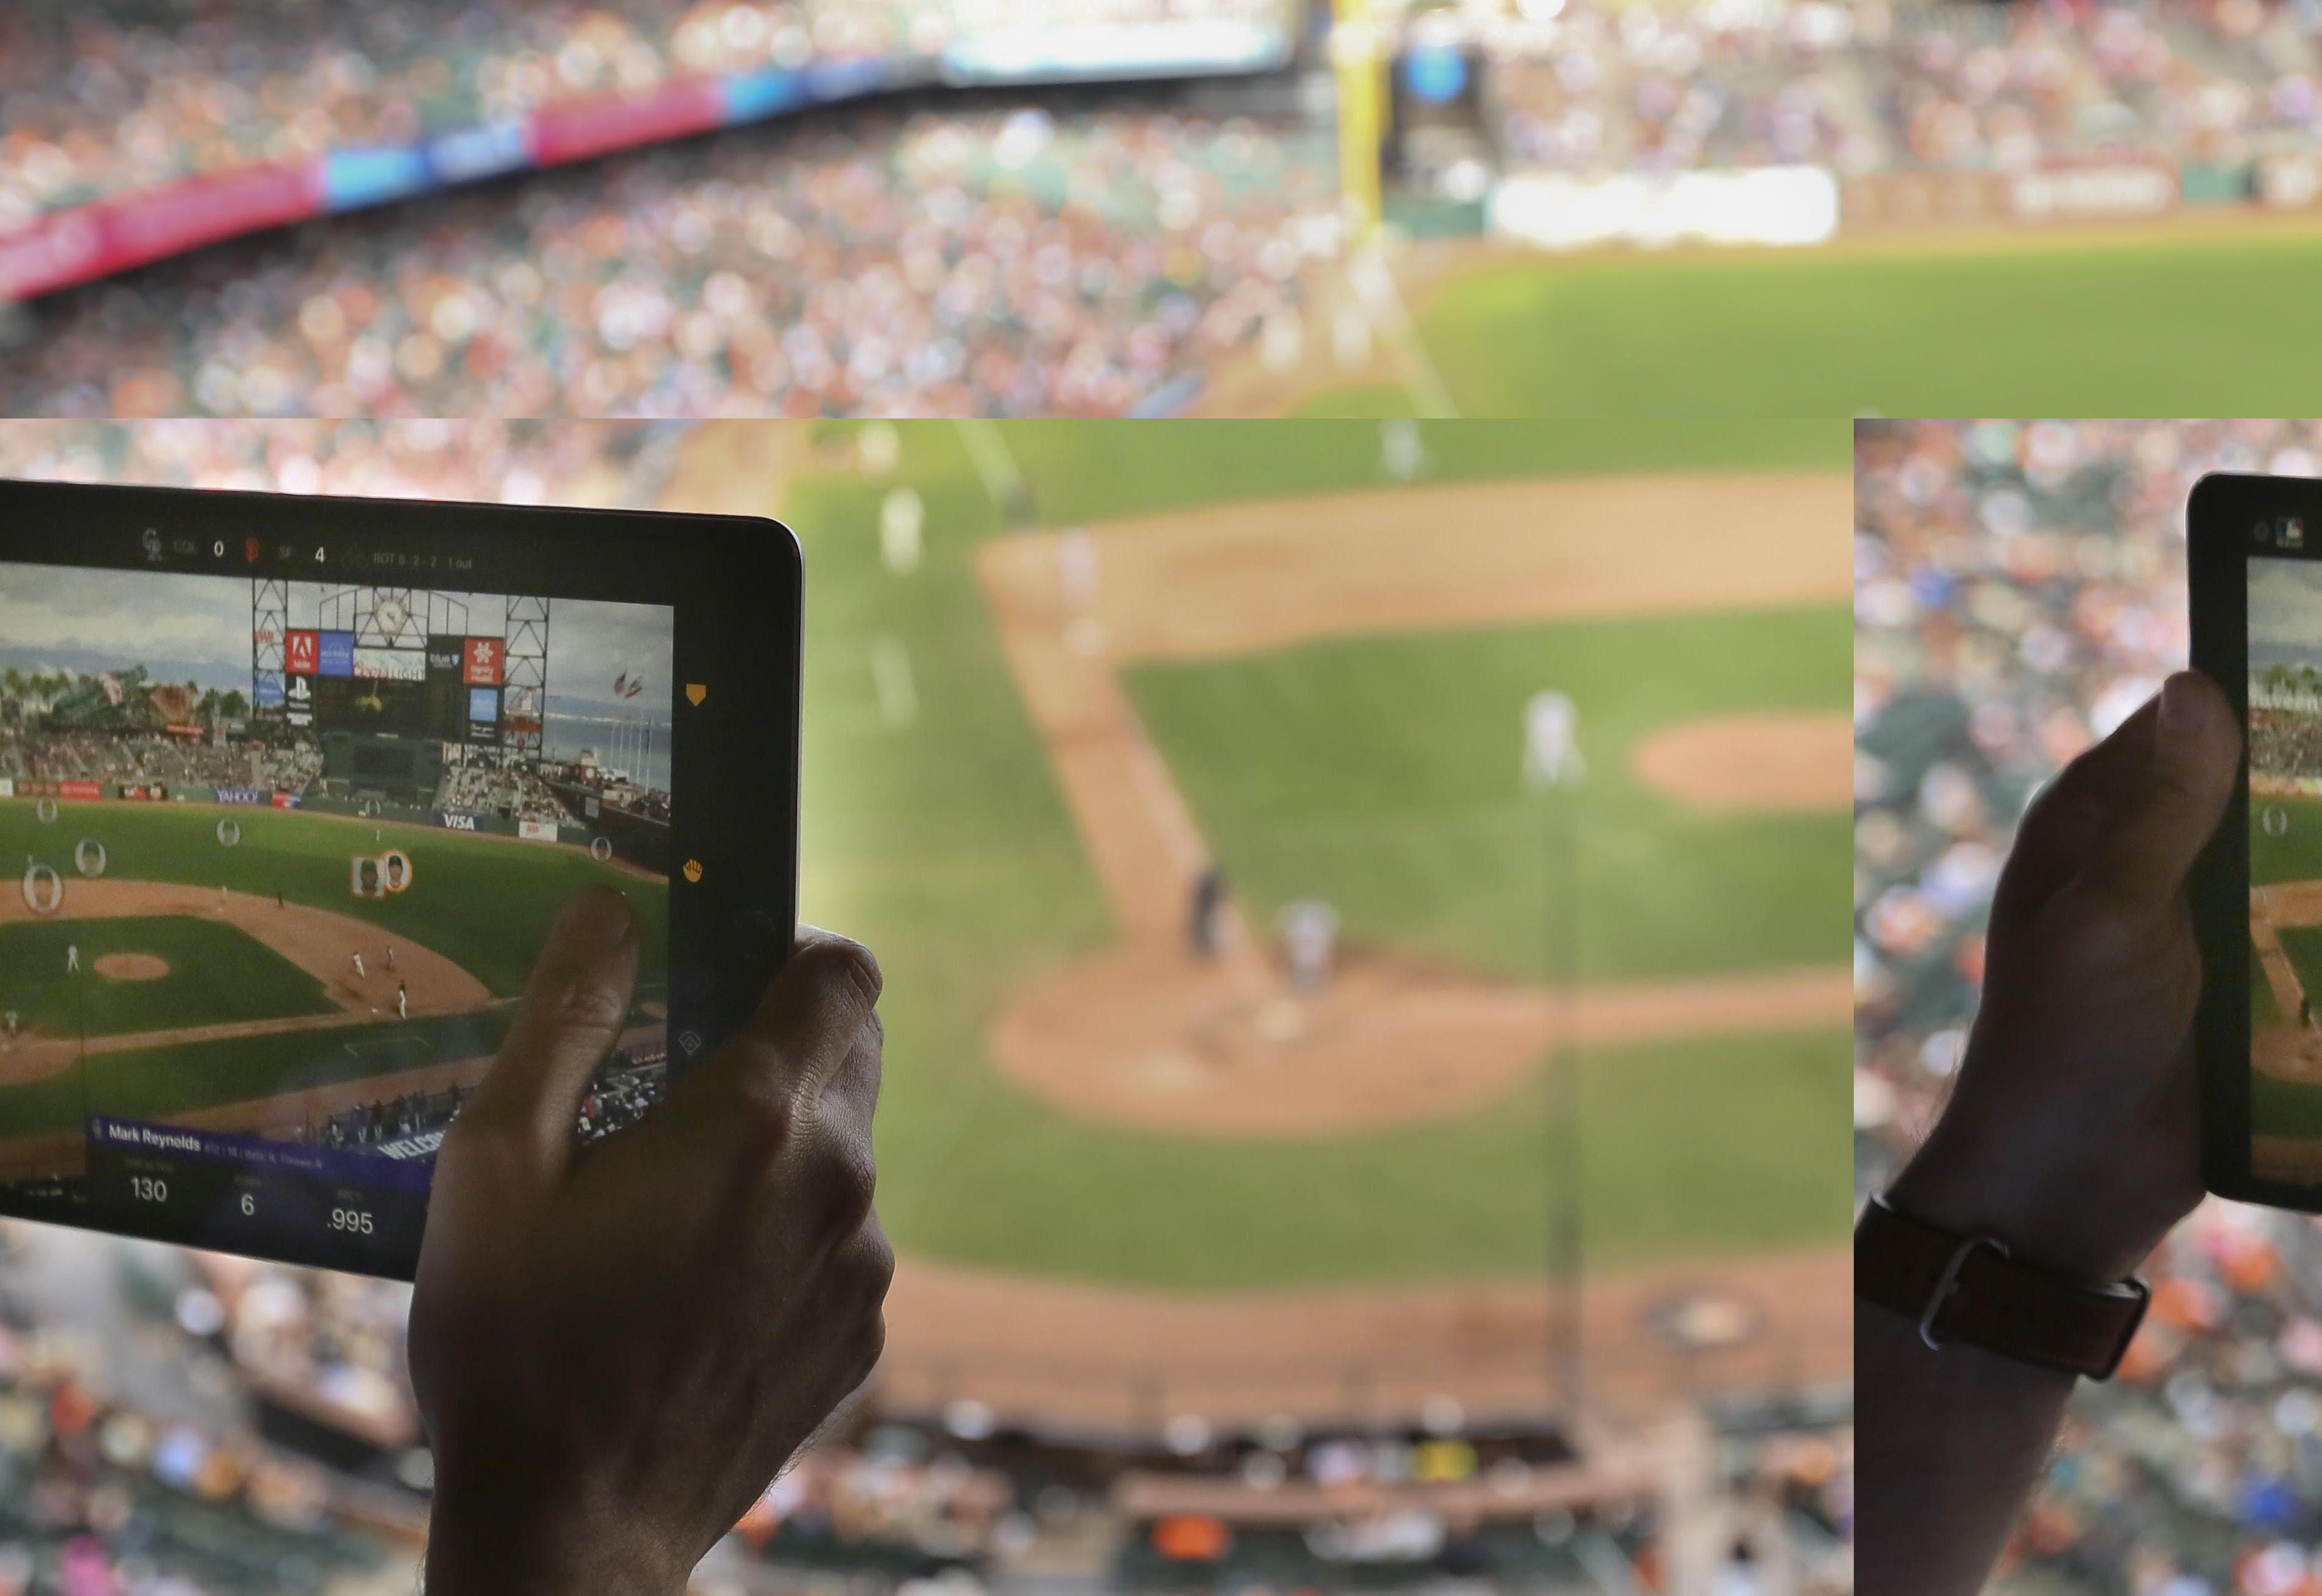 Major League Baseball Launching Augmented Reality App In 2018 Augmented Reality Homerun Augmented Virtual Reality